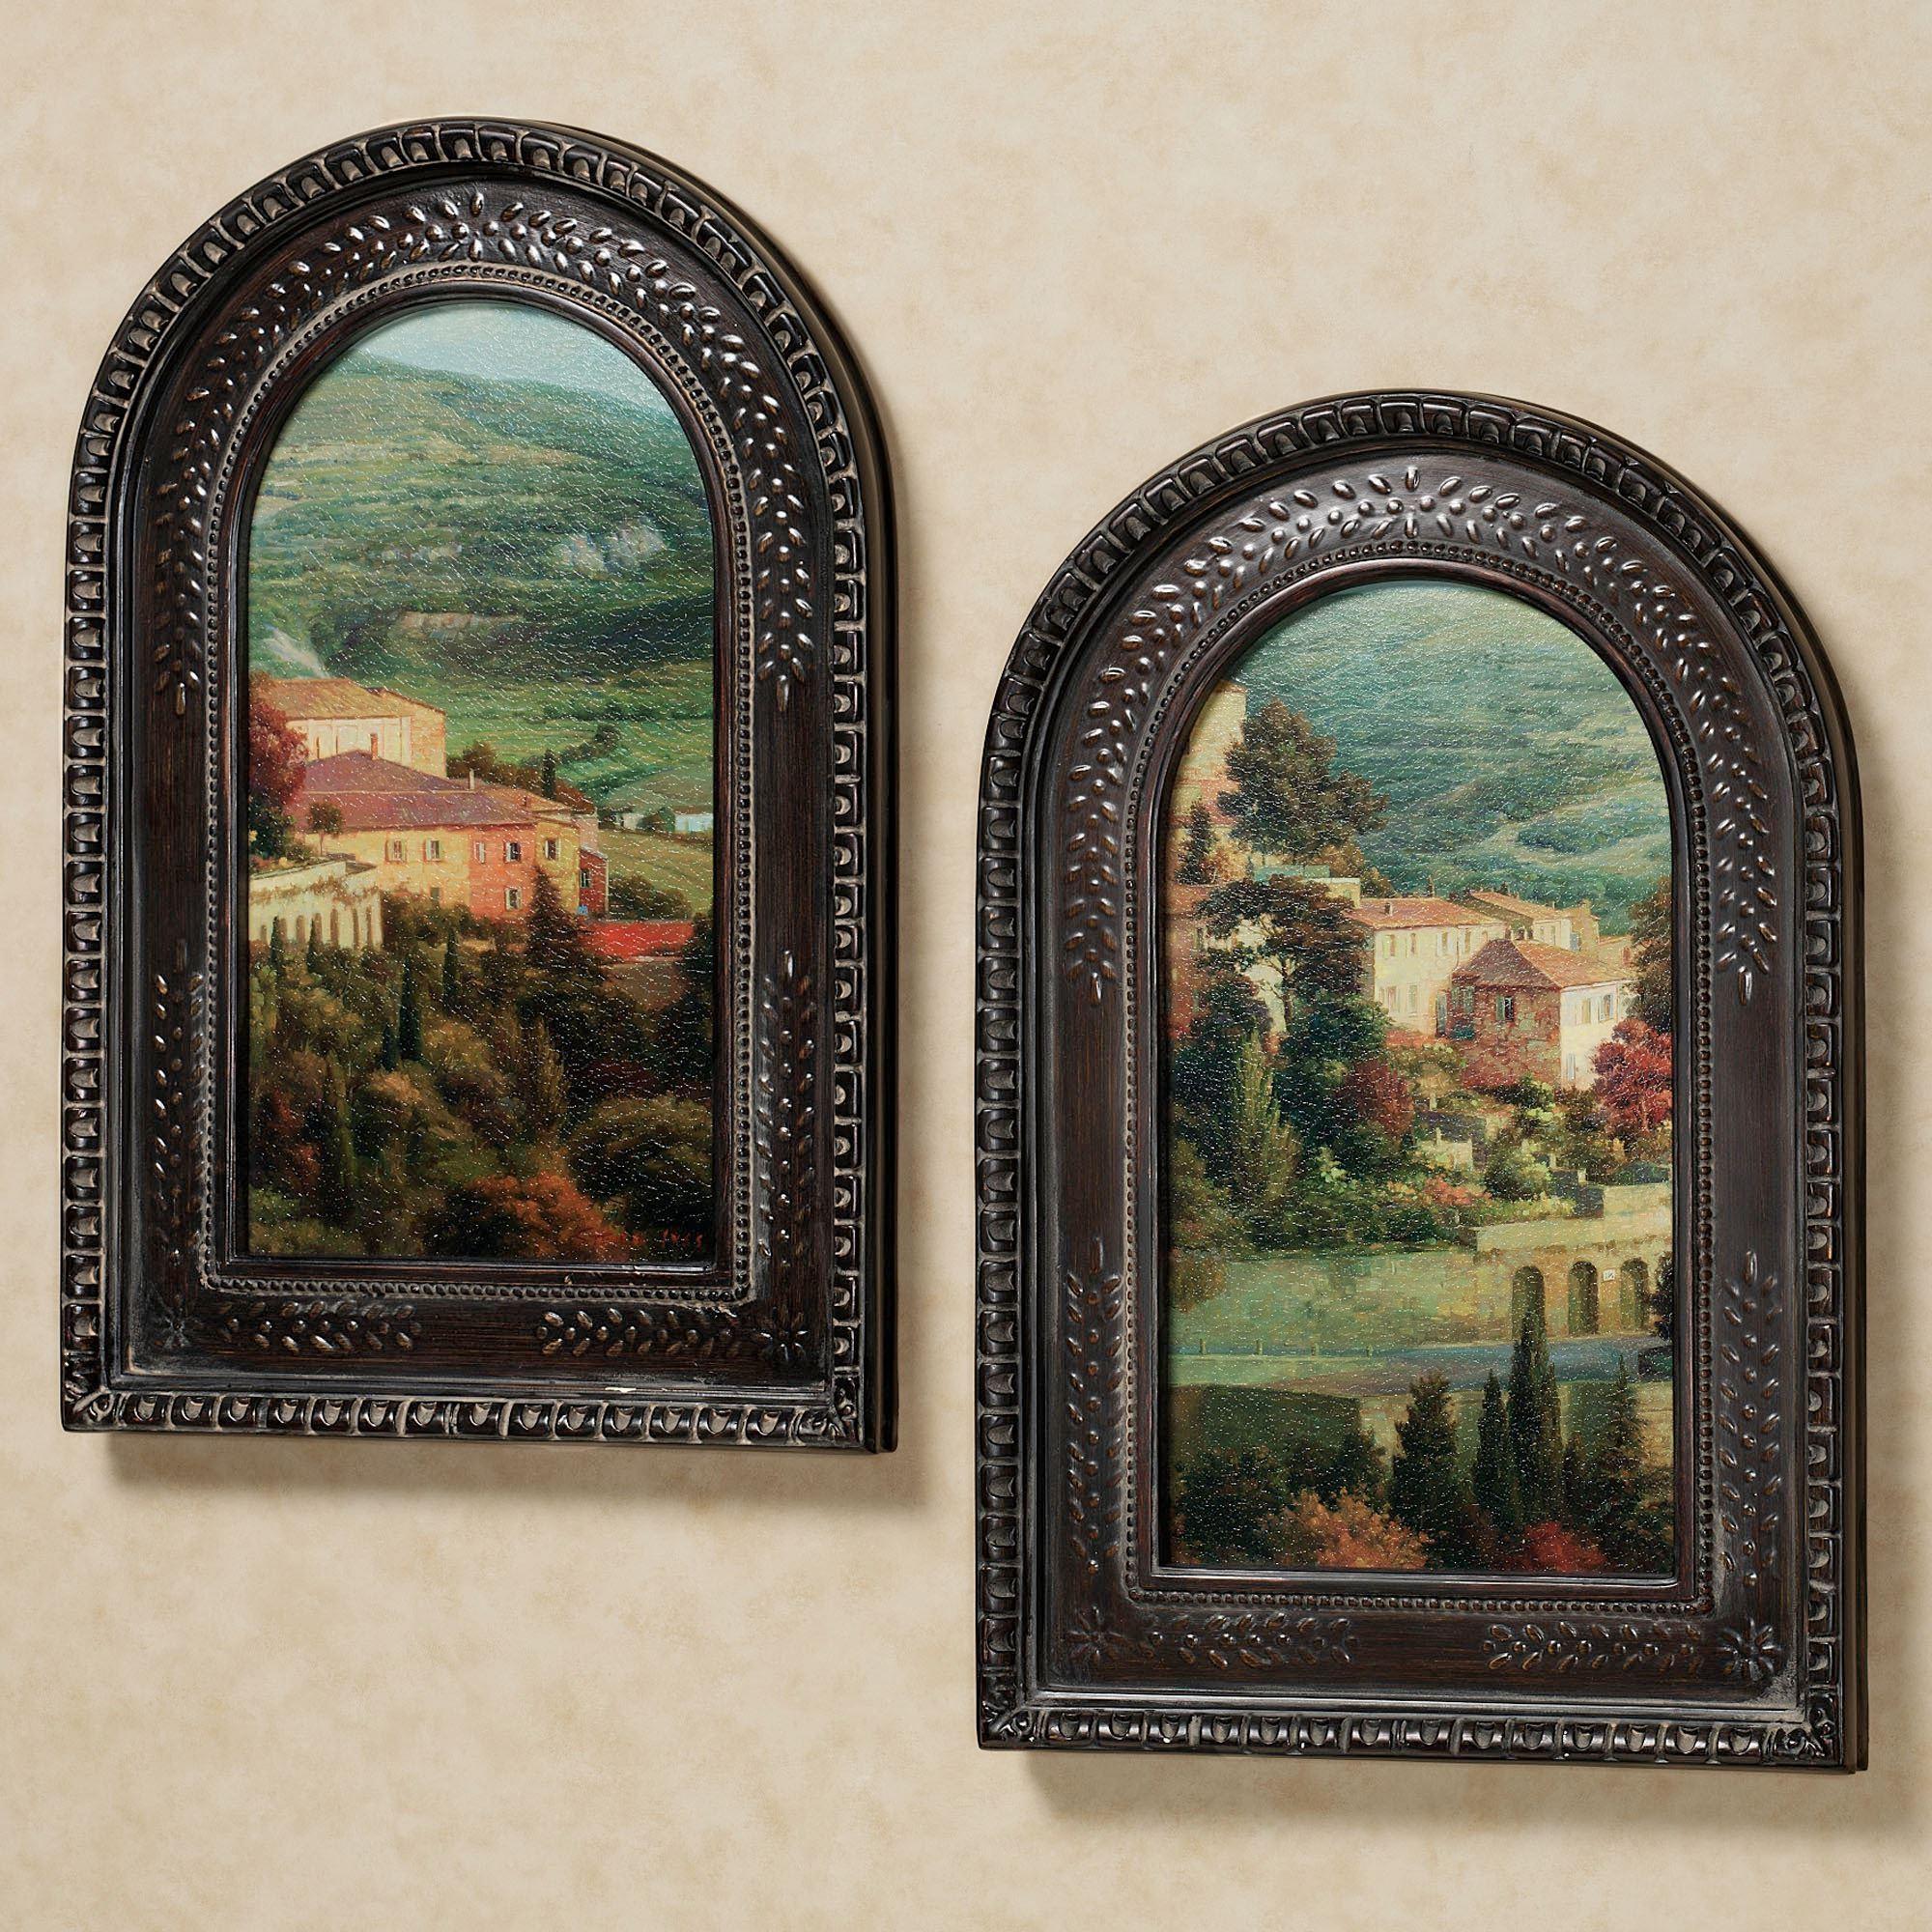 Tuscan And Italian Home Decor | Touch Of Class Regarding Italian Ceramic Wall Art (Image 17 of 20)